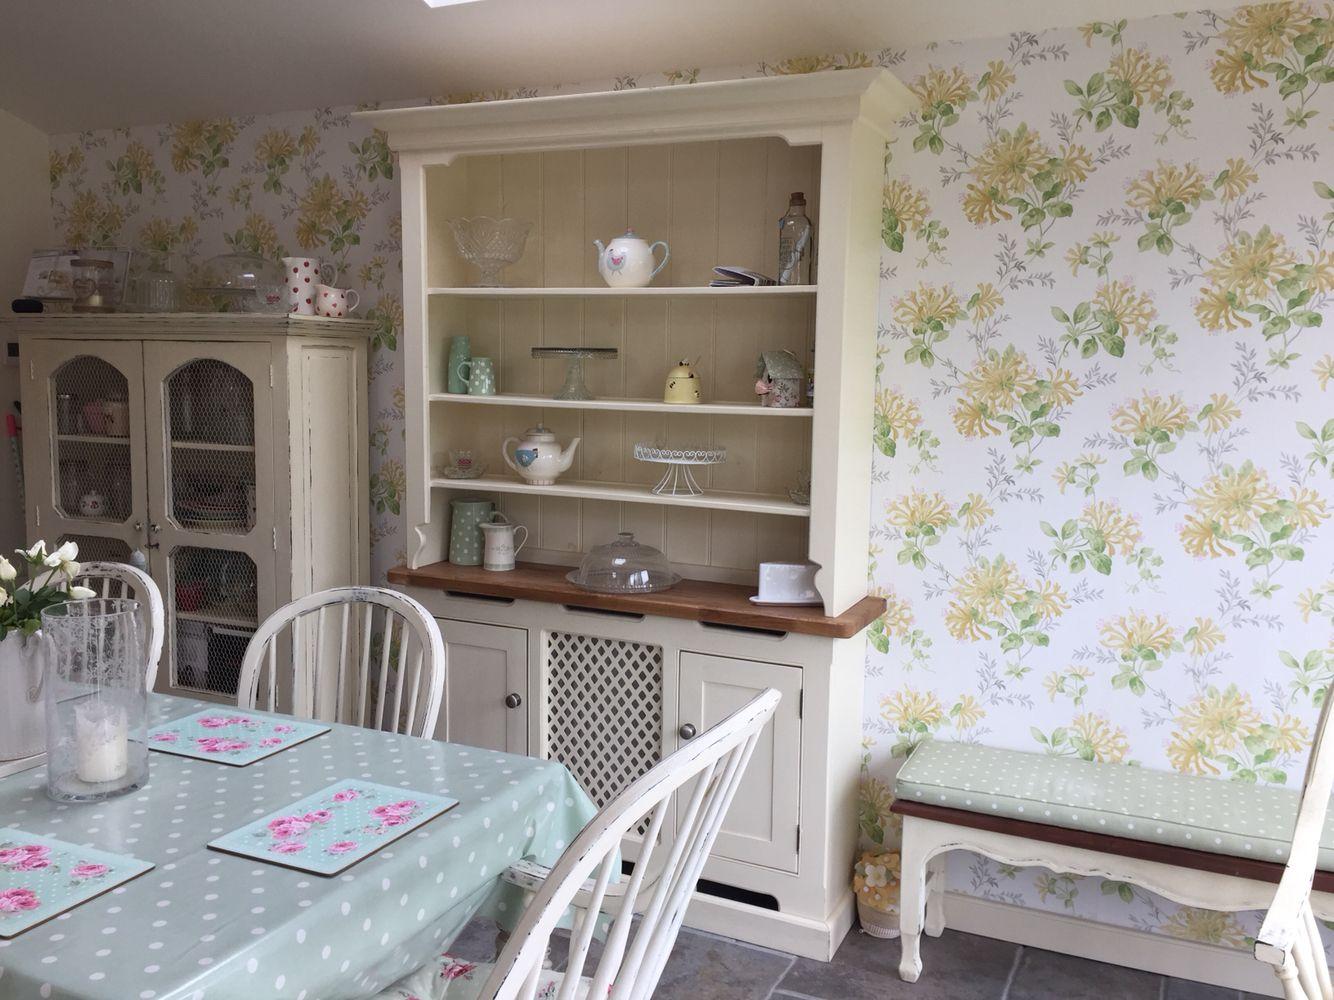 Amazing Kitchen Dresser. Laura Ashley Bramley And Honeysuckle Wallpaper